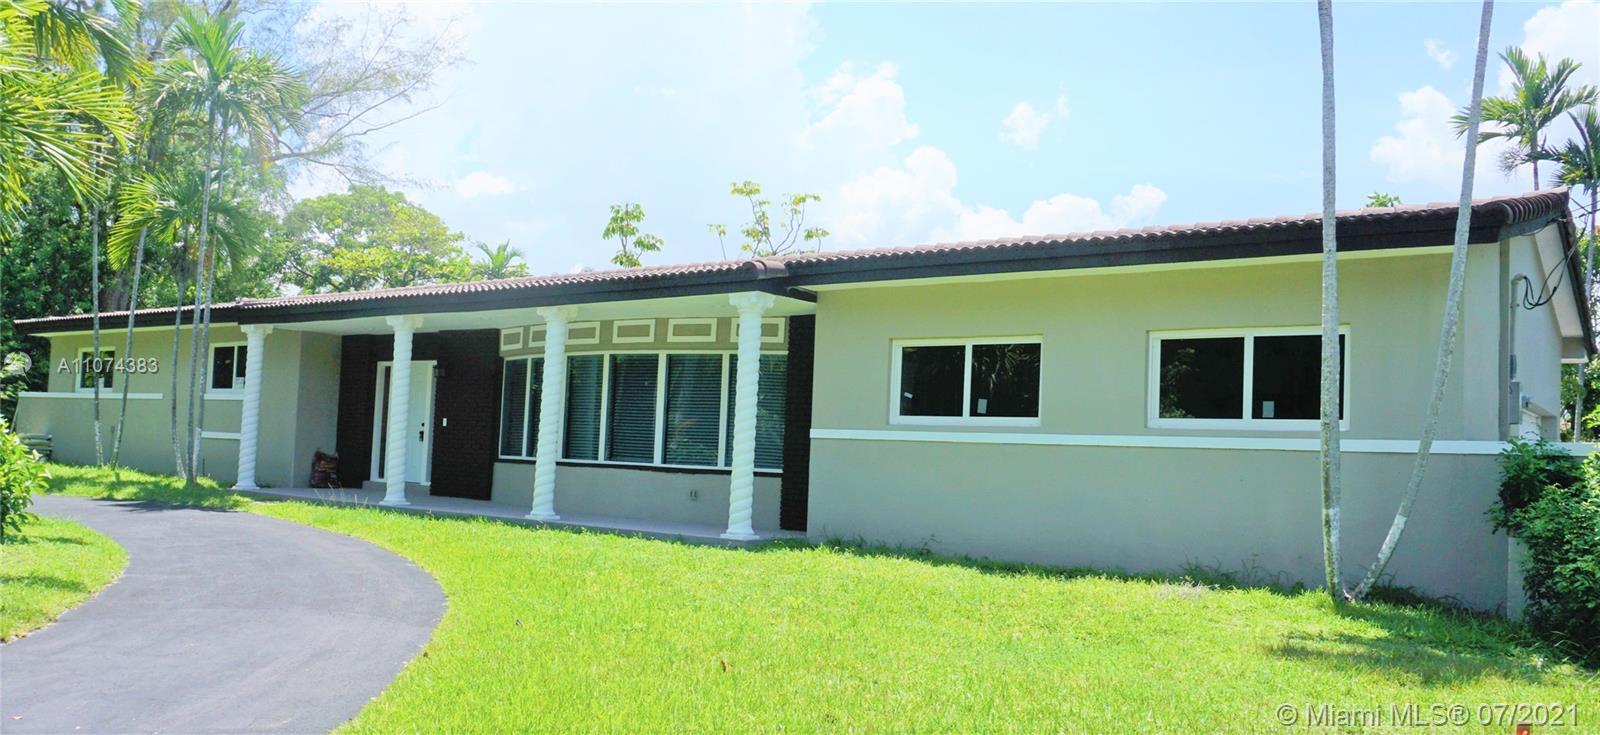 Bisc Gardens - 14600 S Spur Dr, Miami, FL 33161